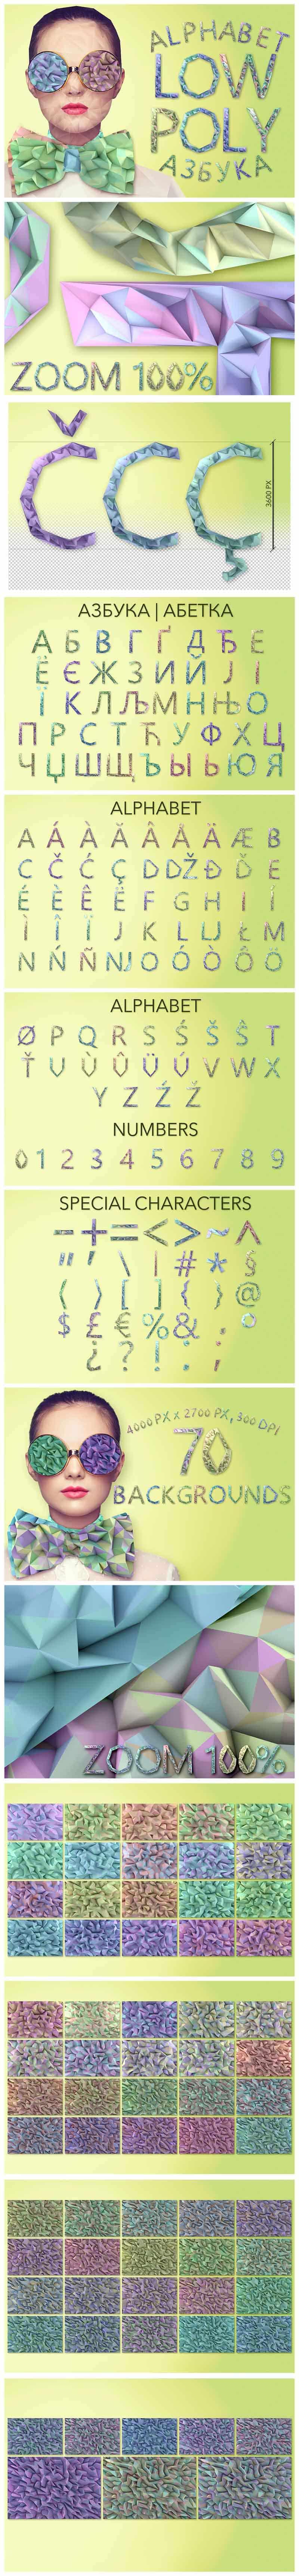 Huge Graphic Bundle Alphabet with 1000+ elements - $25 - Low Poly min